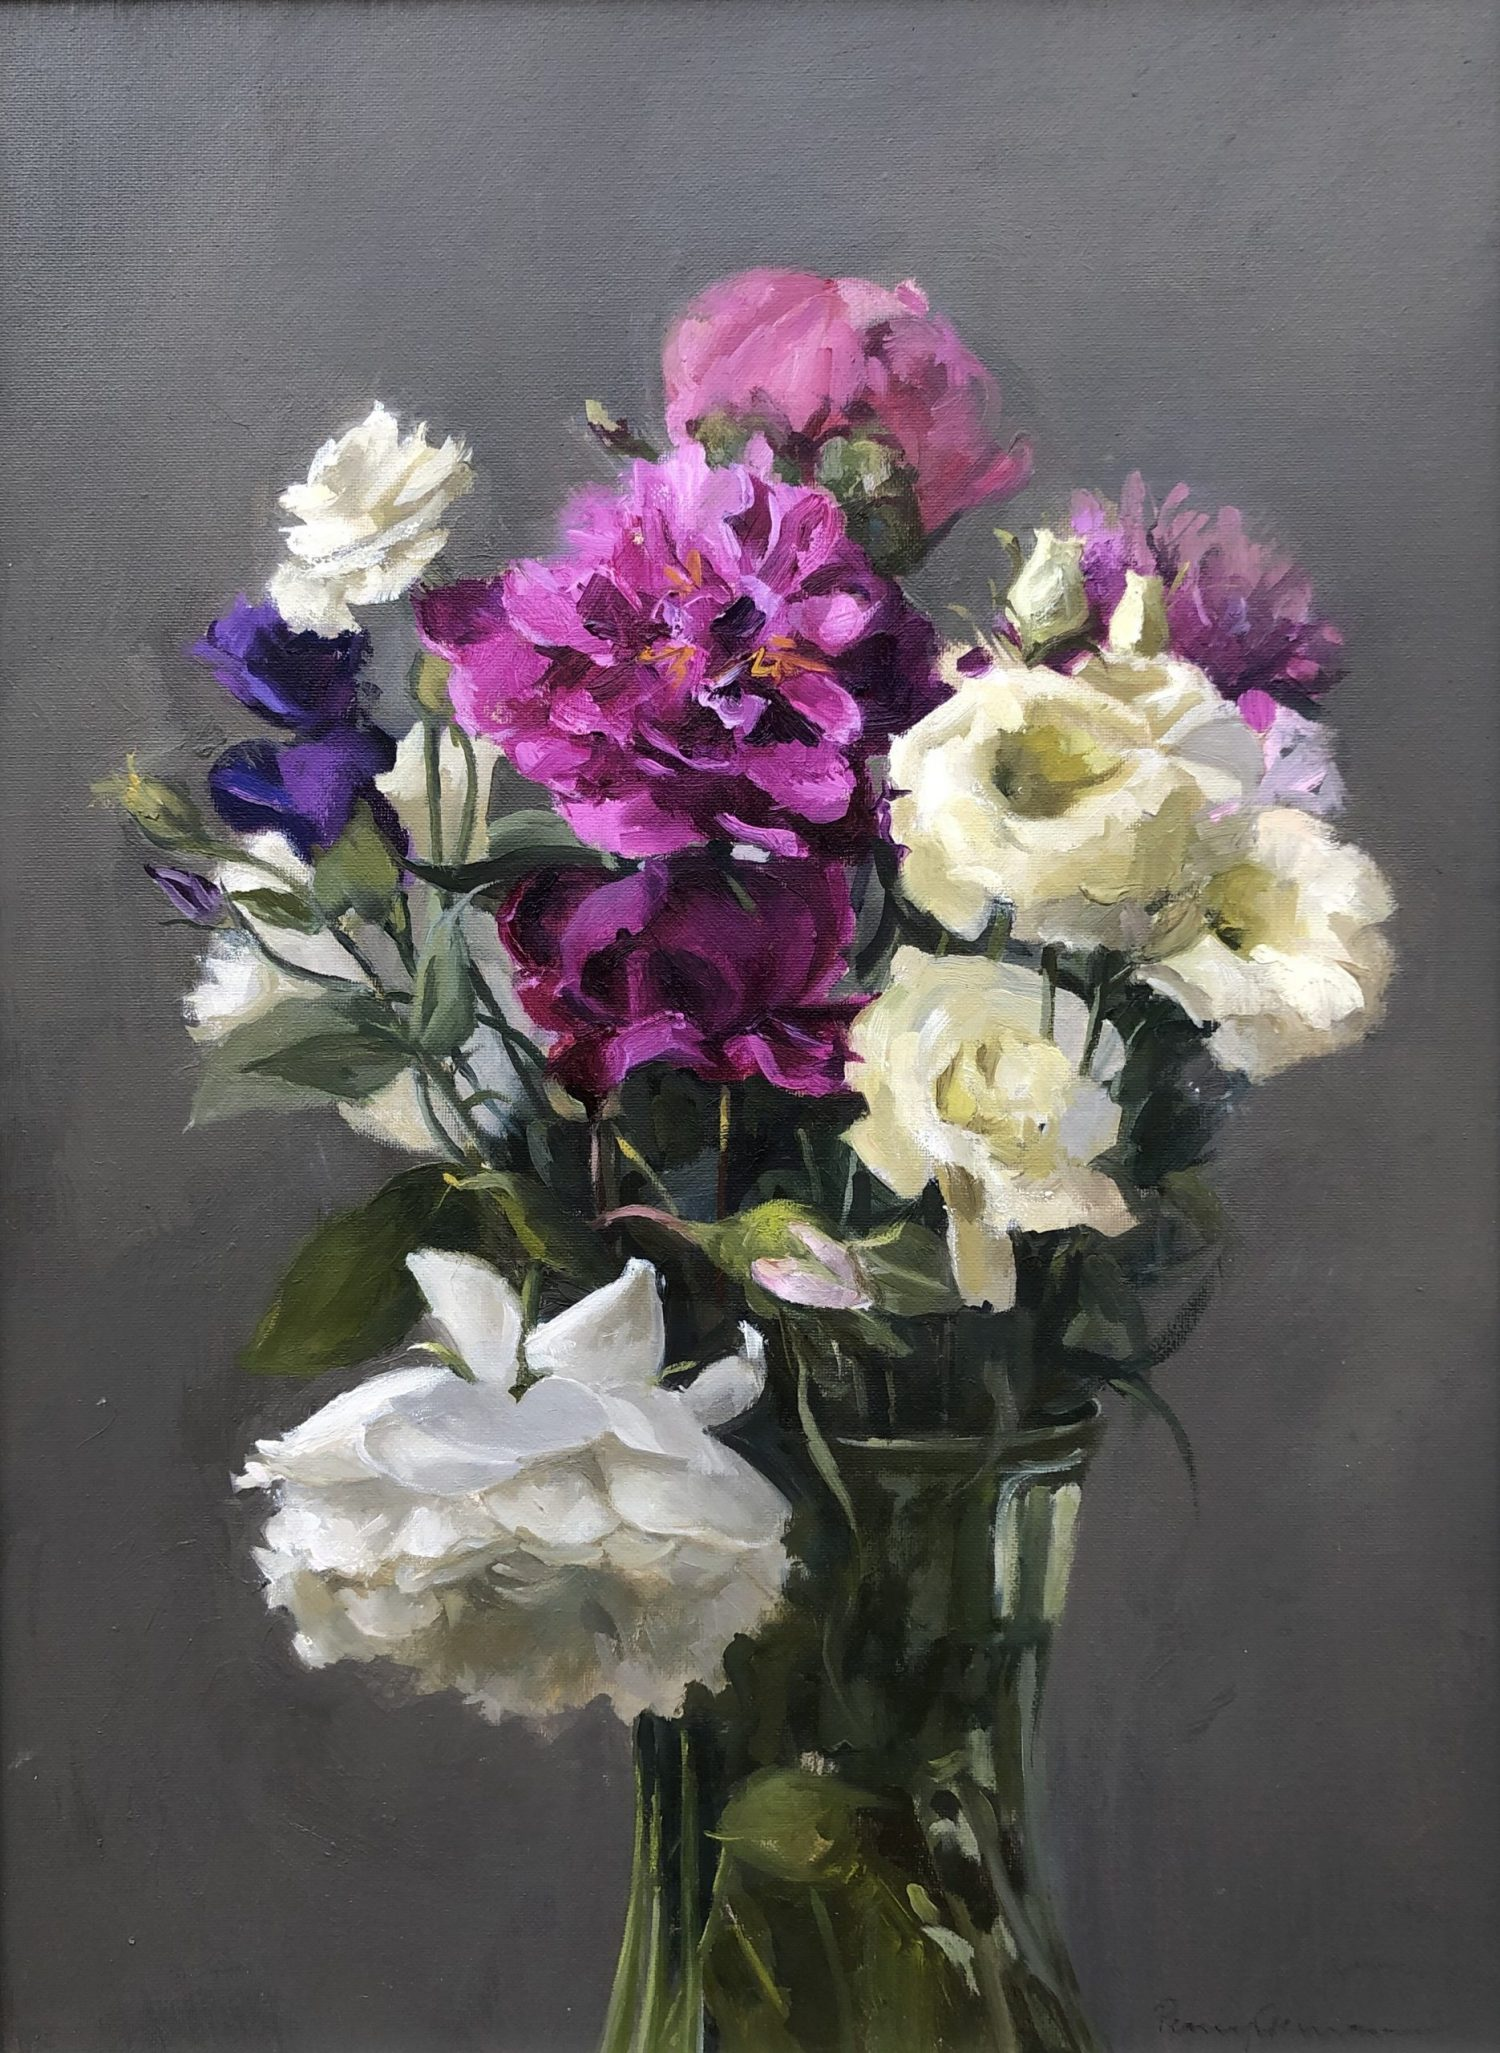 Bouquet by Penny German